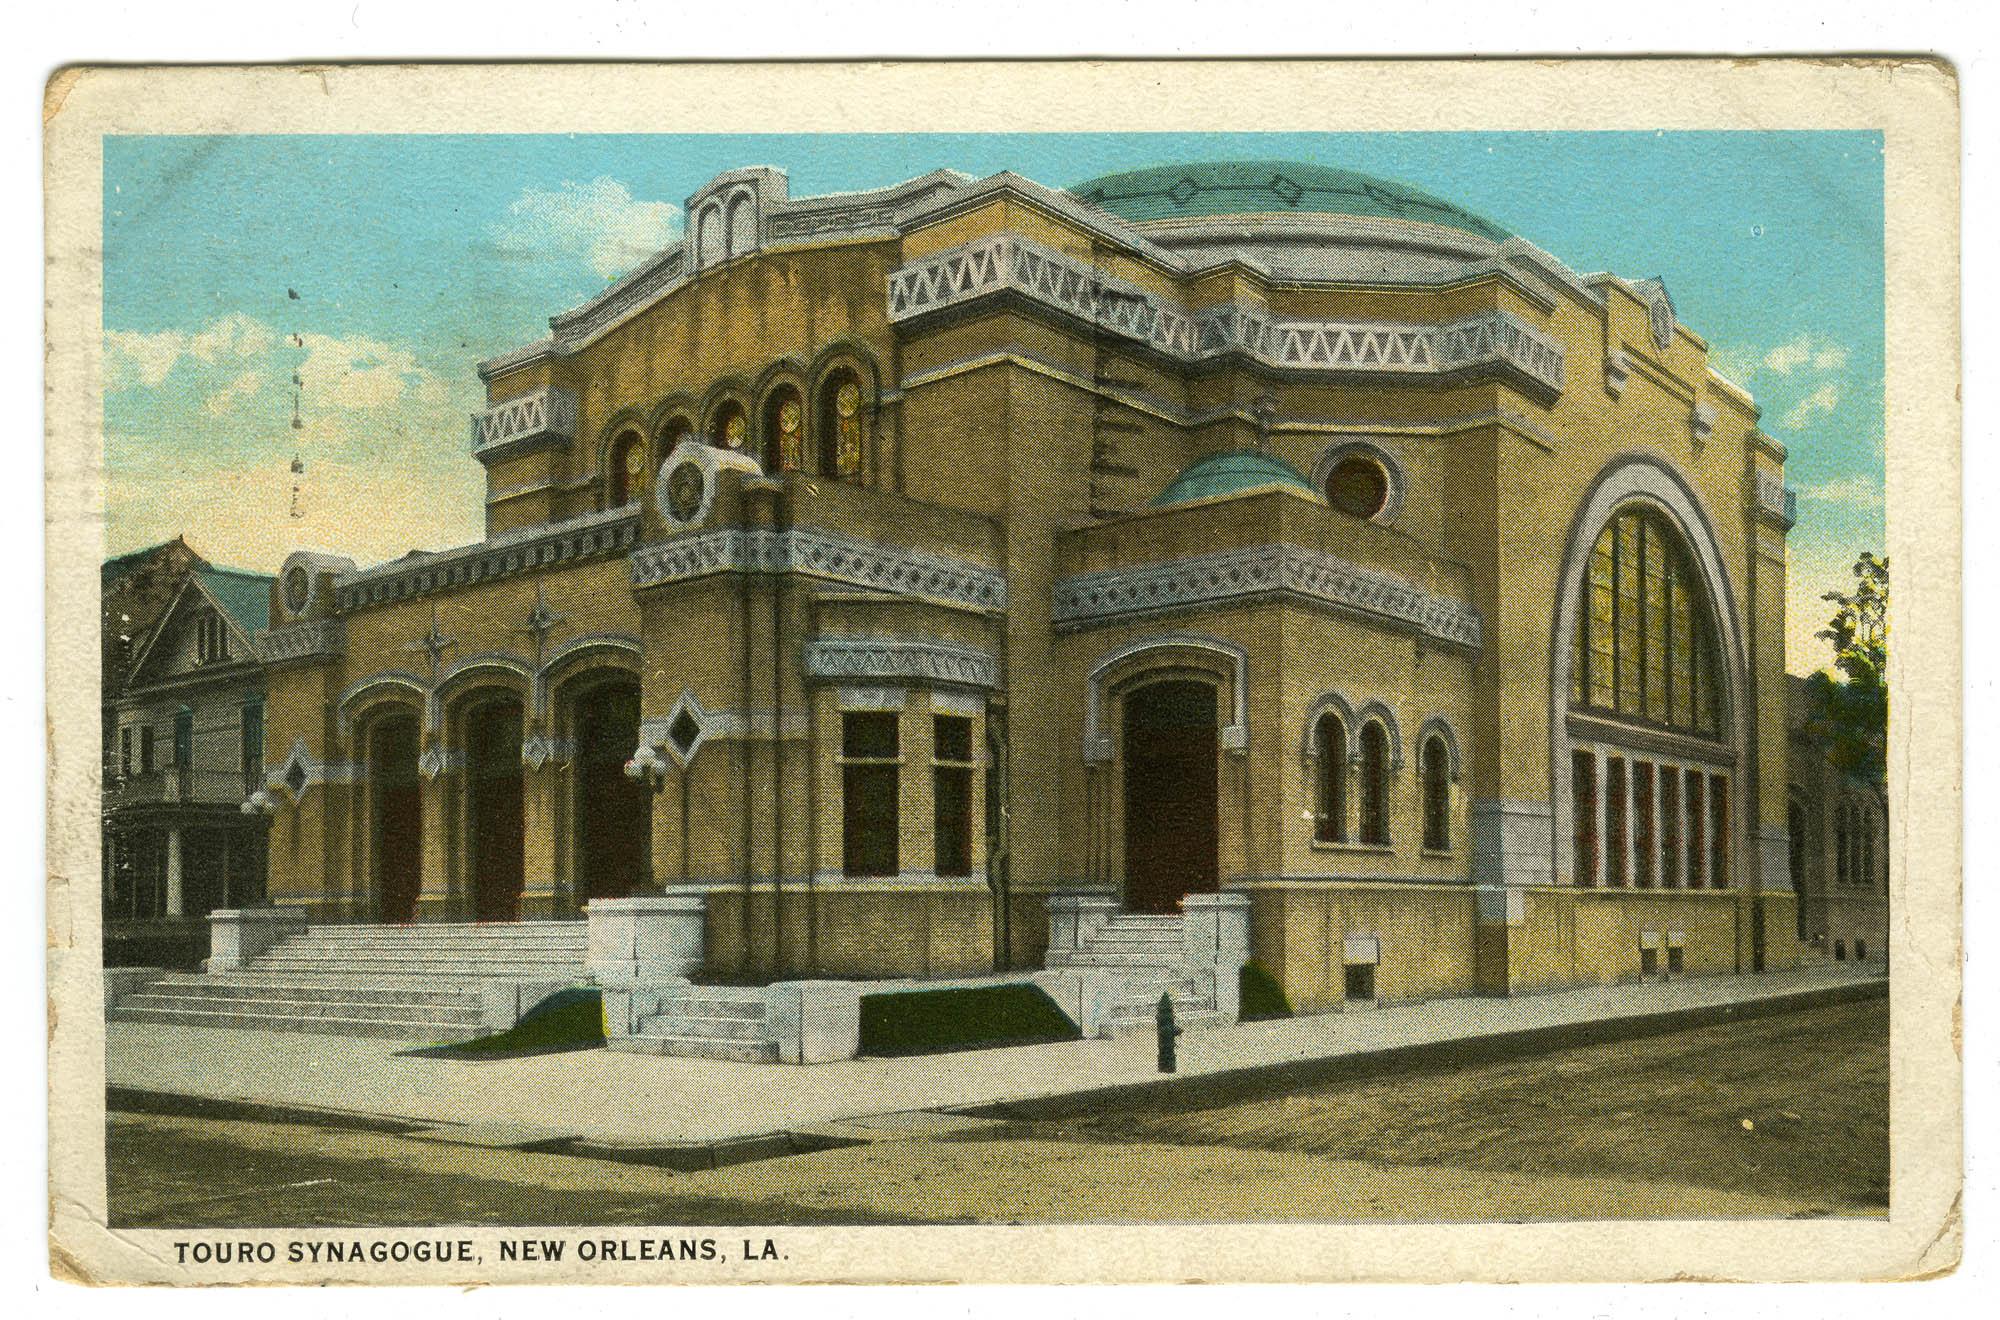 Touro Synagogue, New Orleans, La.